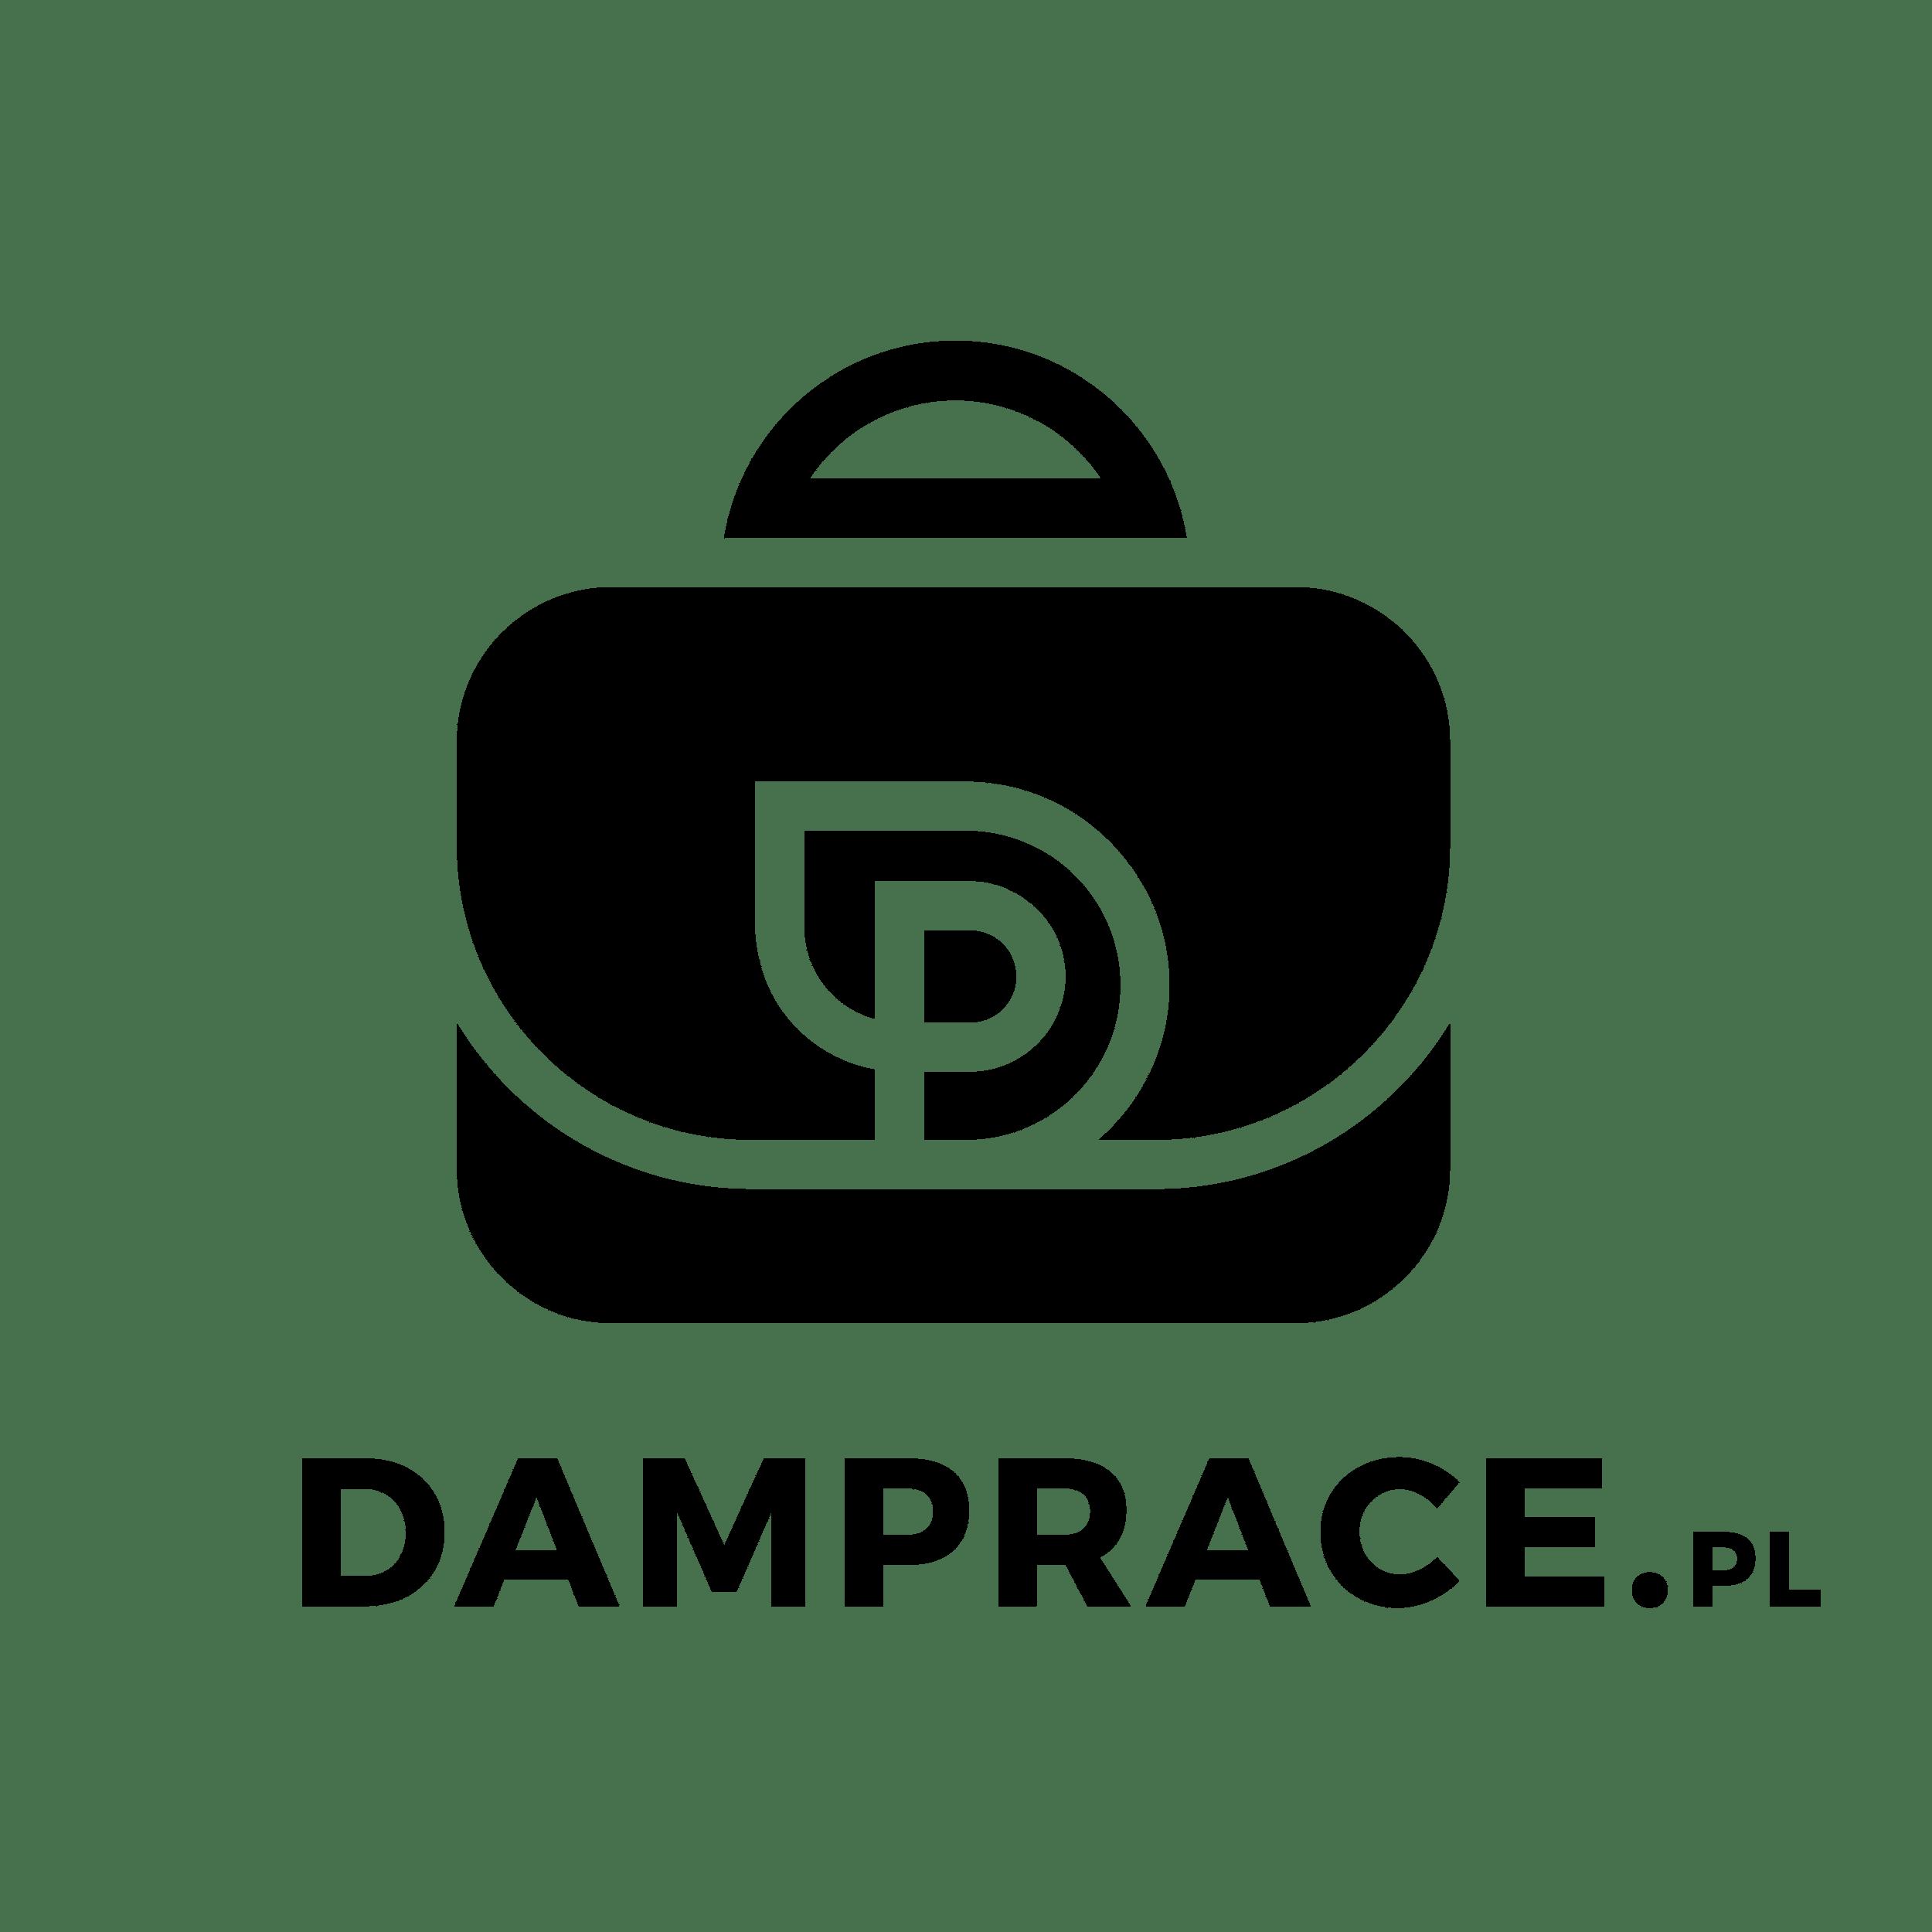 damprace_logo_black